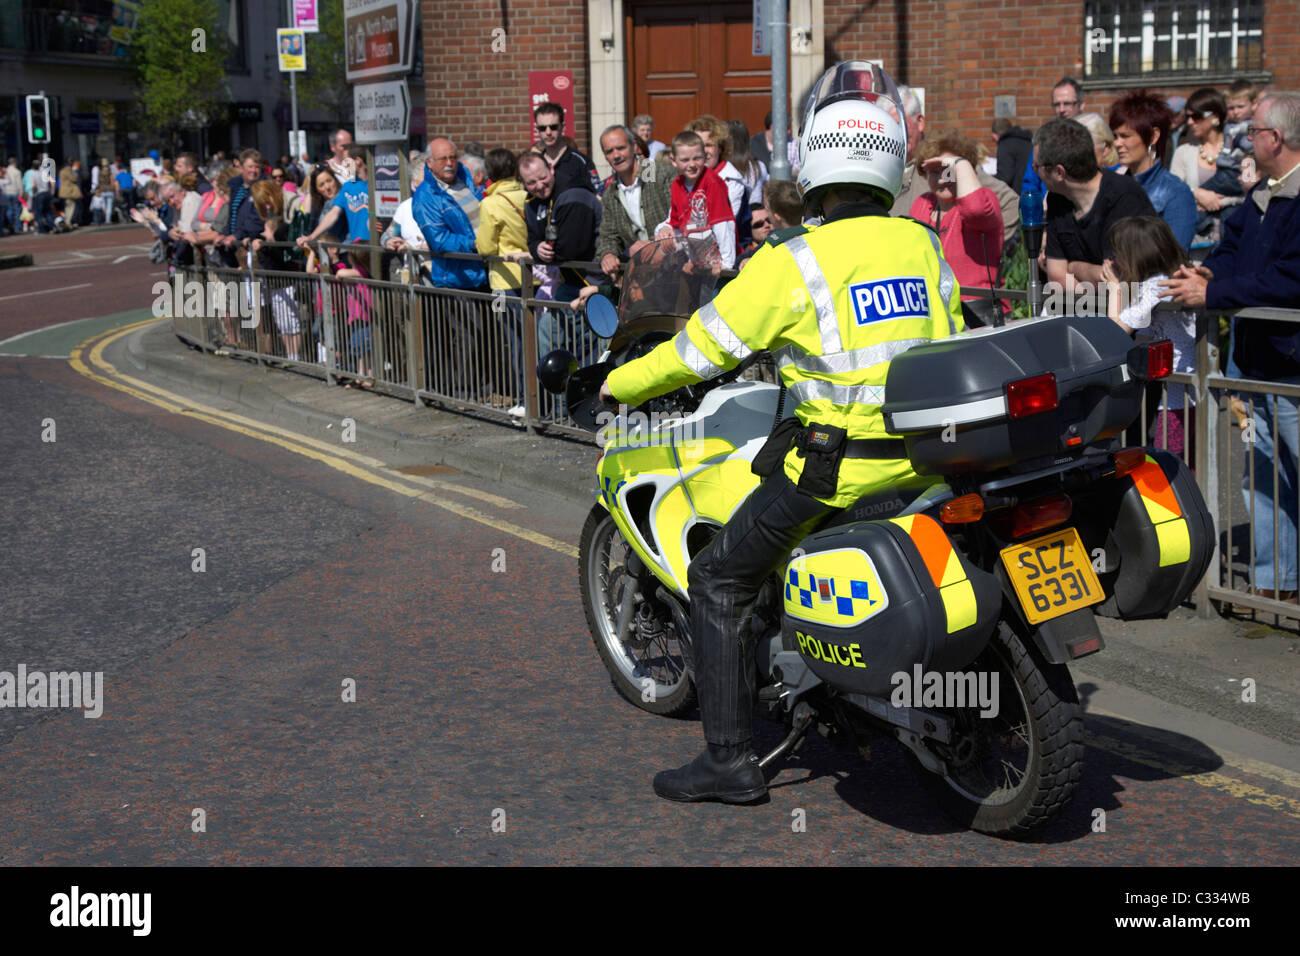 Moto police psni agent de circulation au cours d'escorte en parade bangor comté de Down en Irlande du Nord Photo Stock